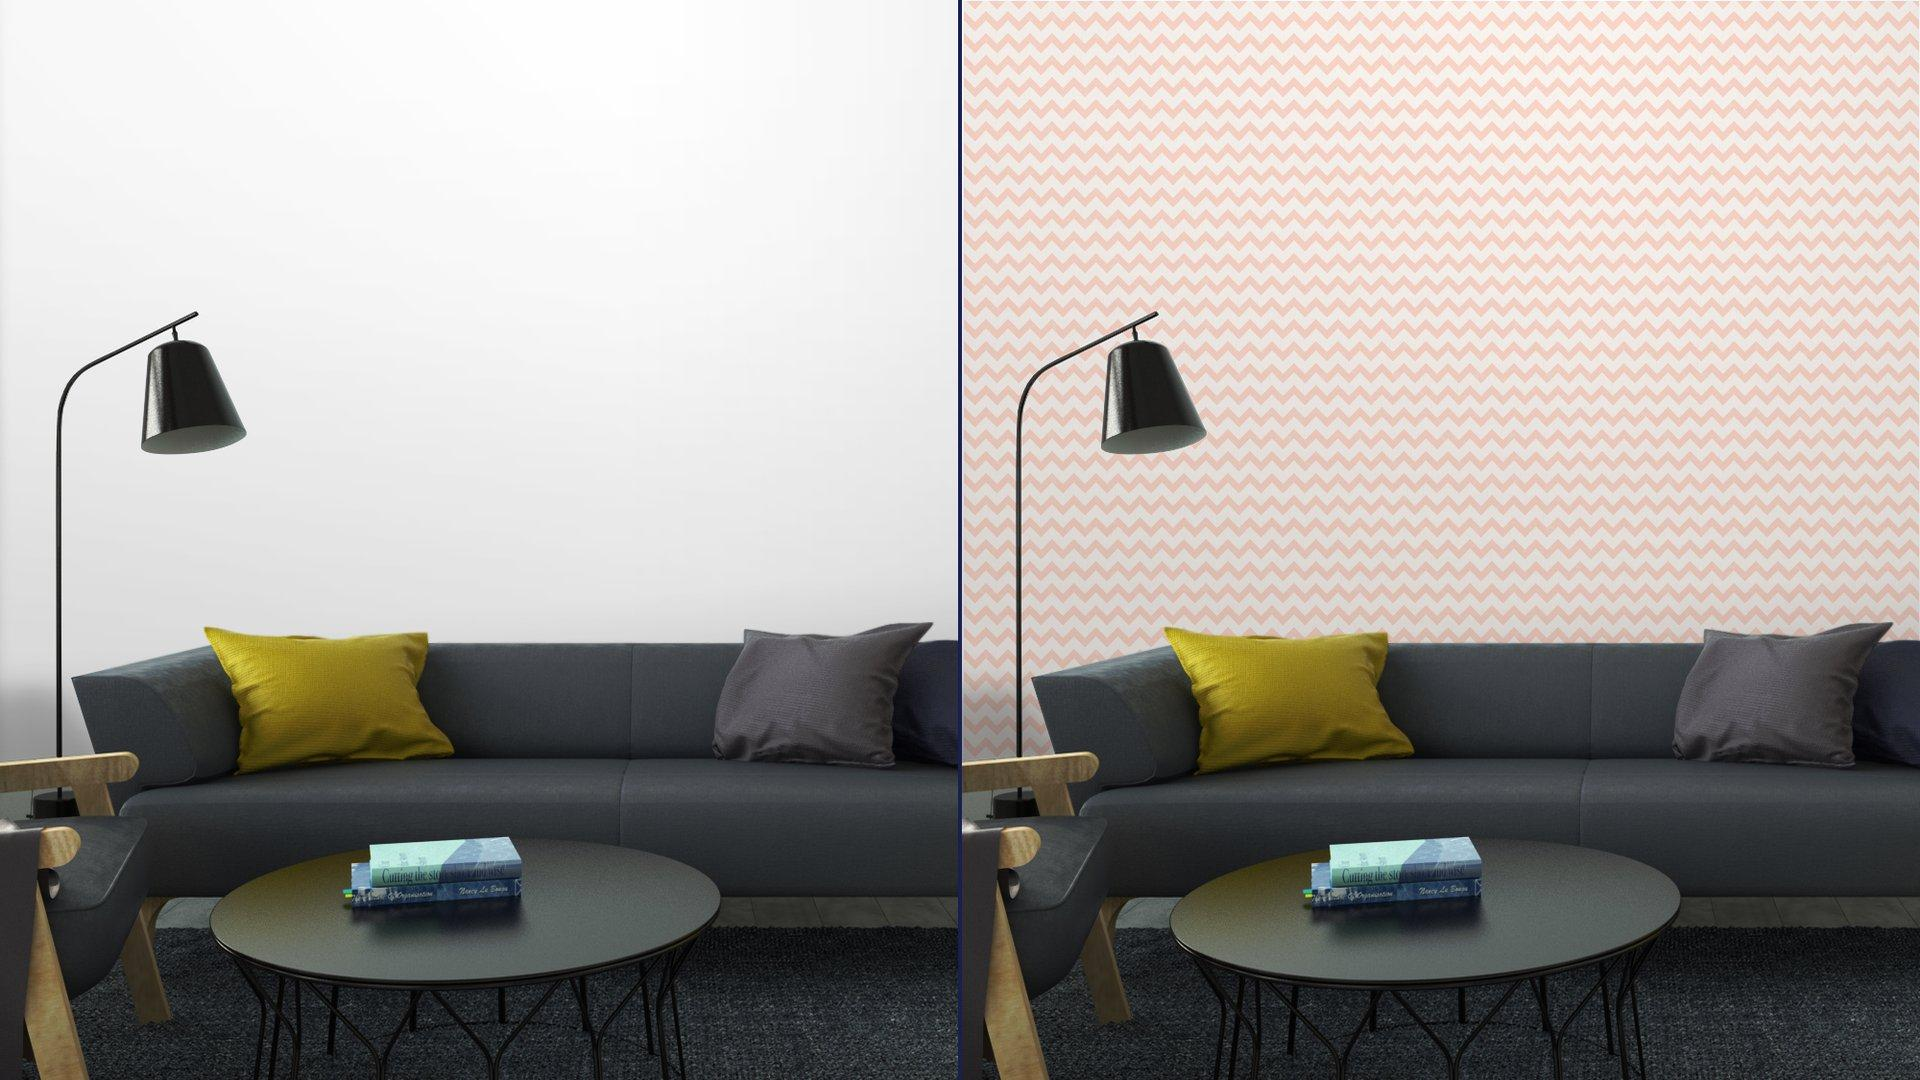 Fotomurales mexico papeles pintados lavables sin patron de color rosa chevron 5 - PapelTapizZig Zag Rosa Fondo Blanco 01